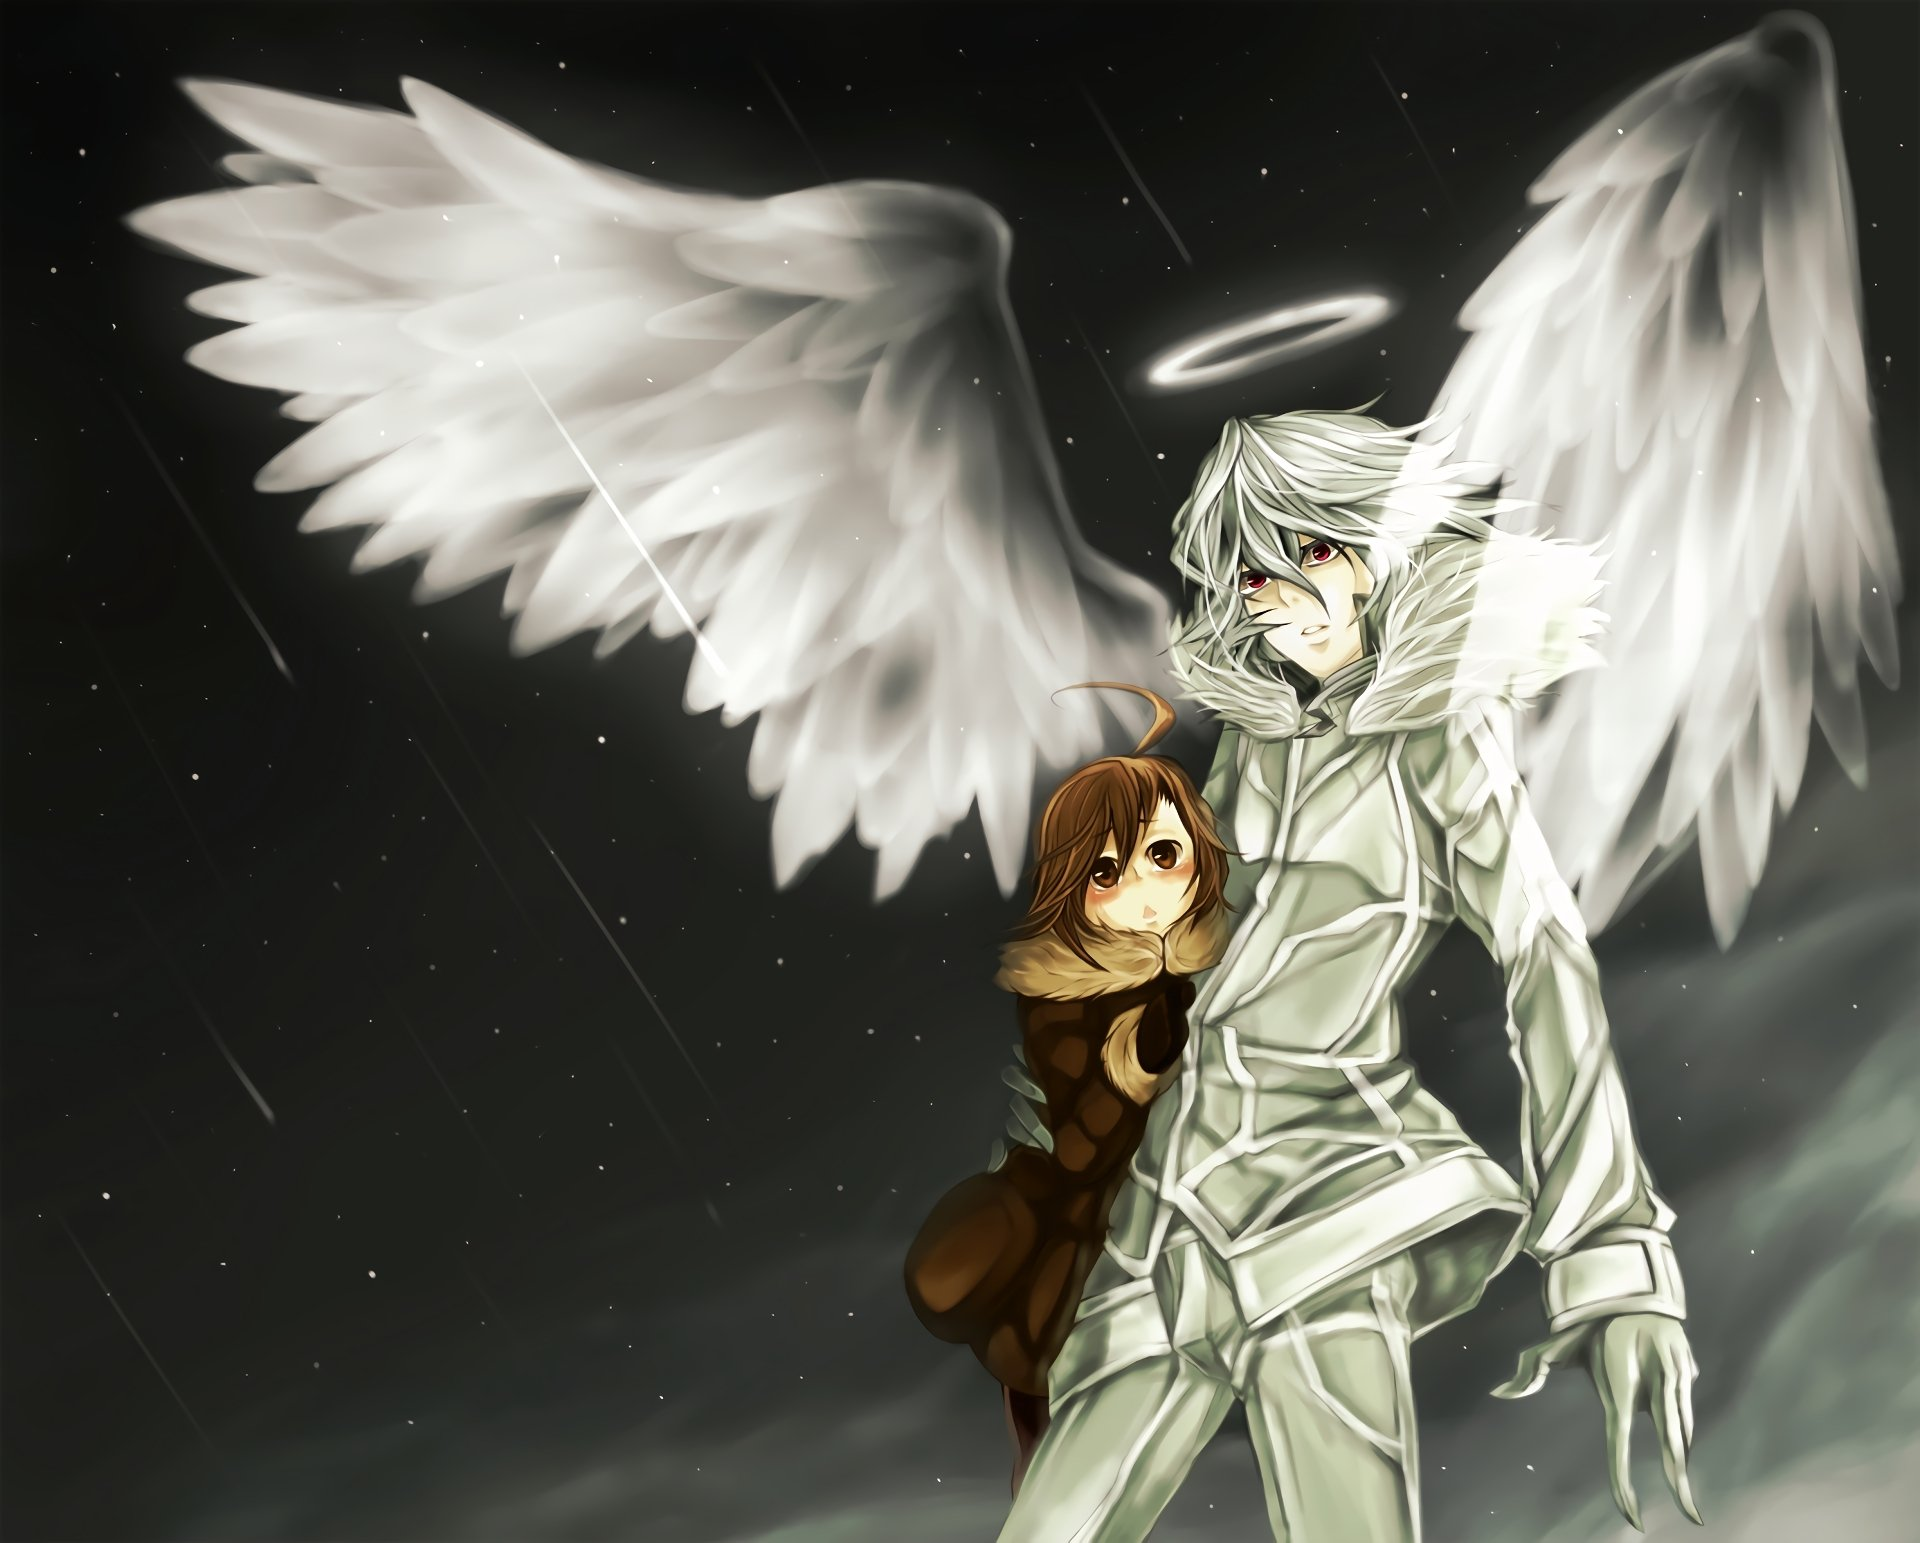 Toaru Majutsu No Index Full HD Wallpaper And Background Image